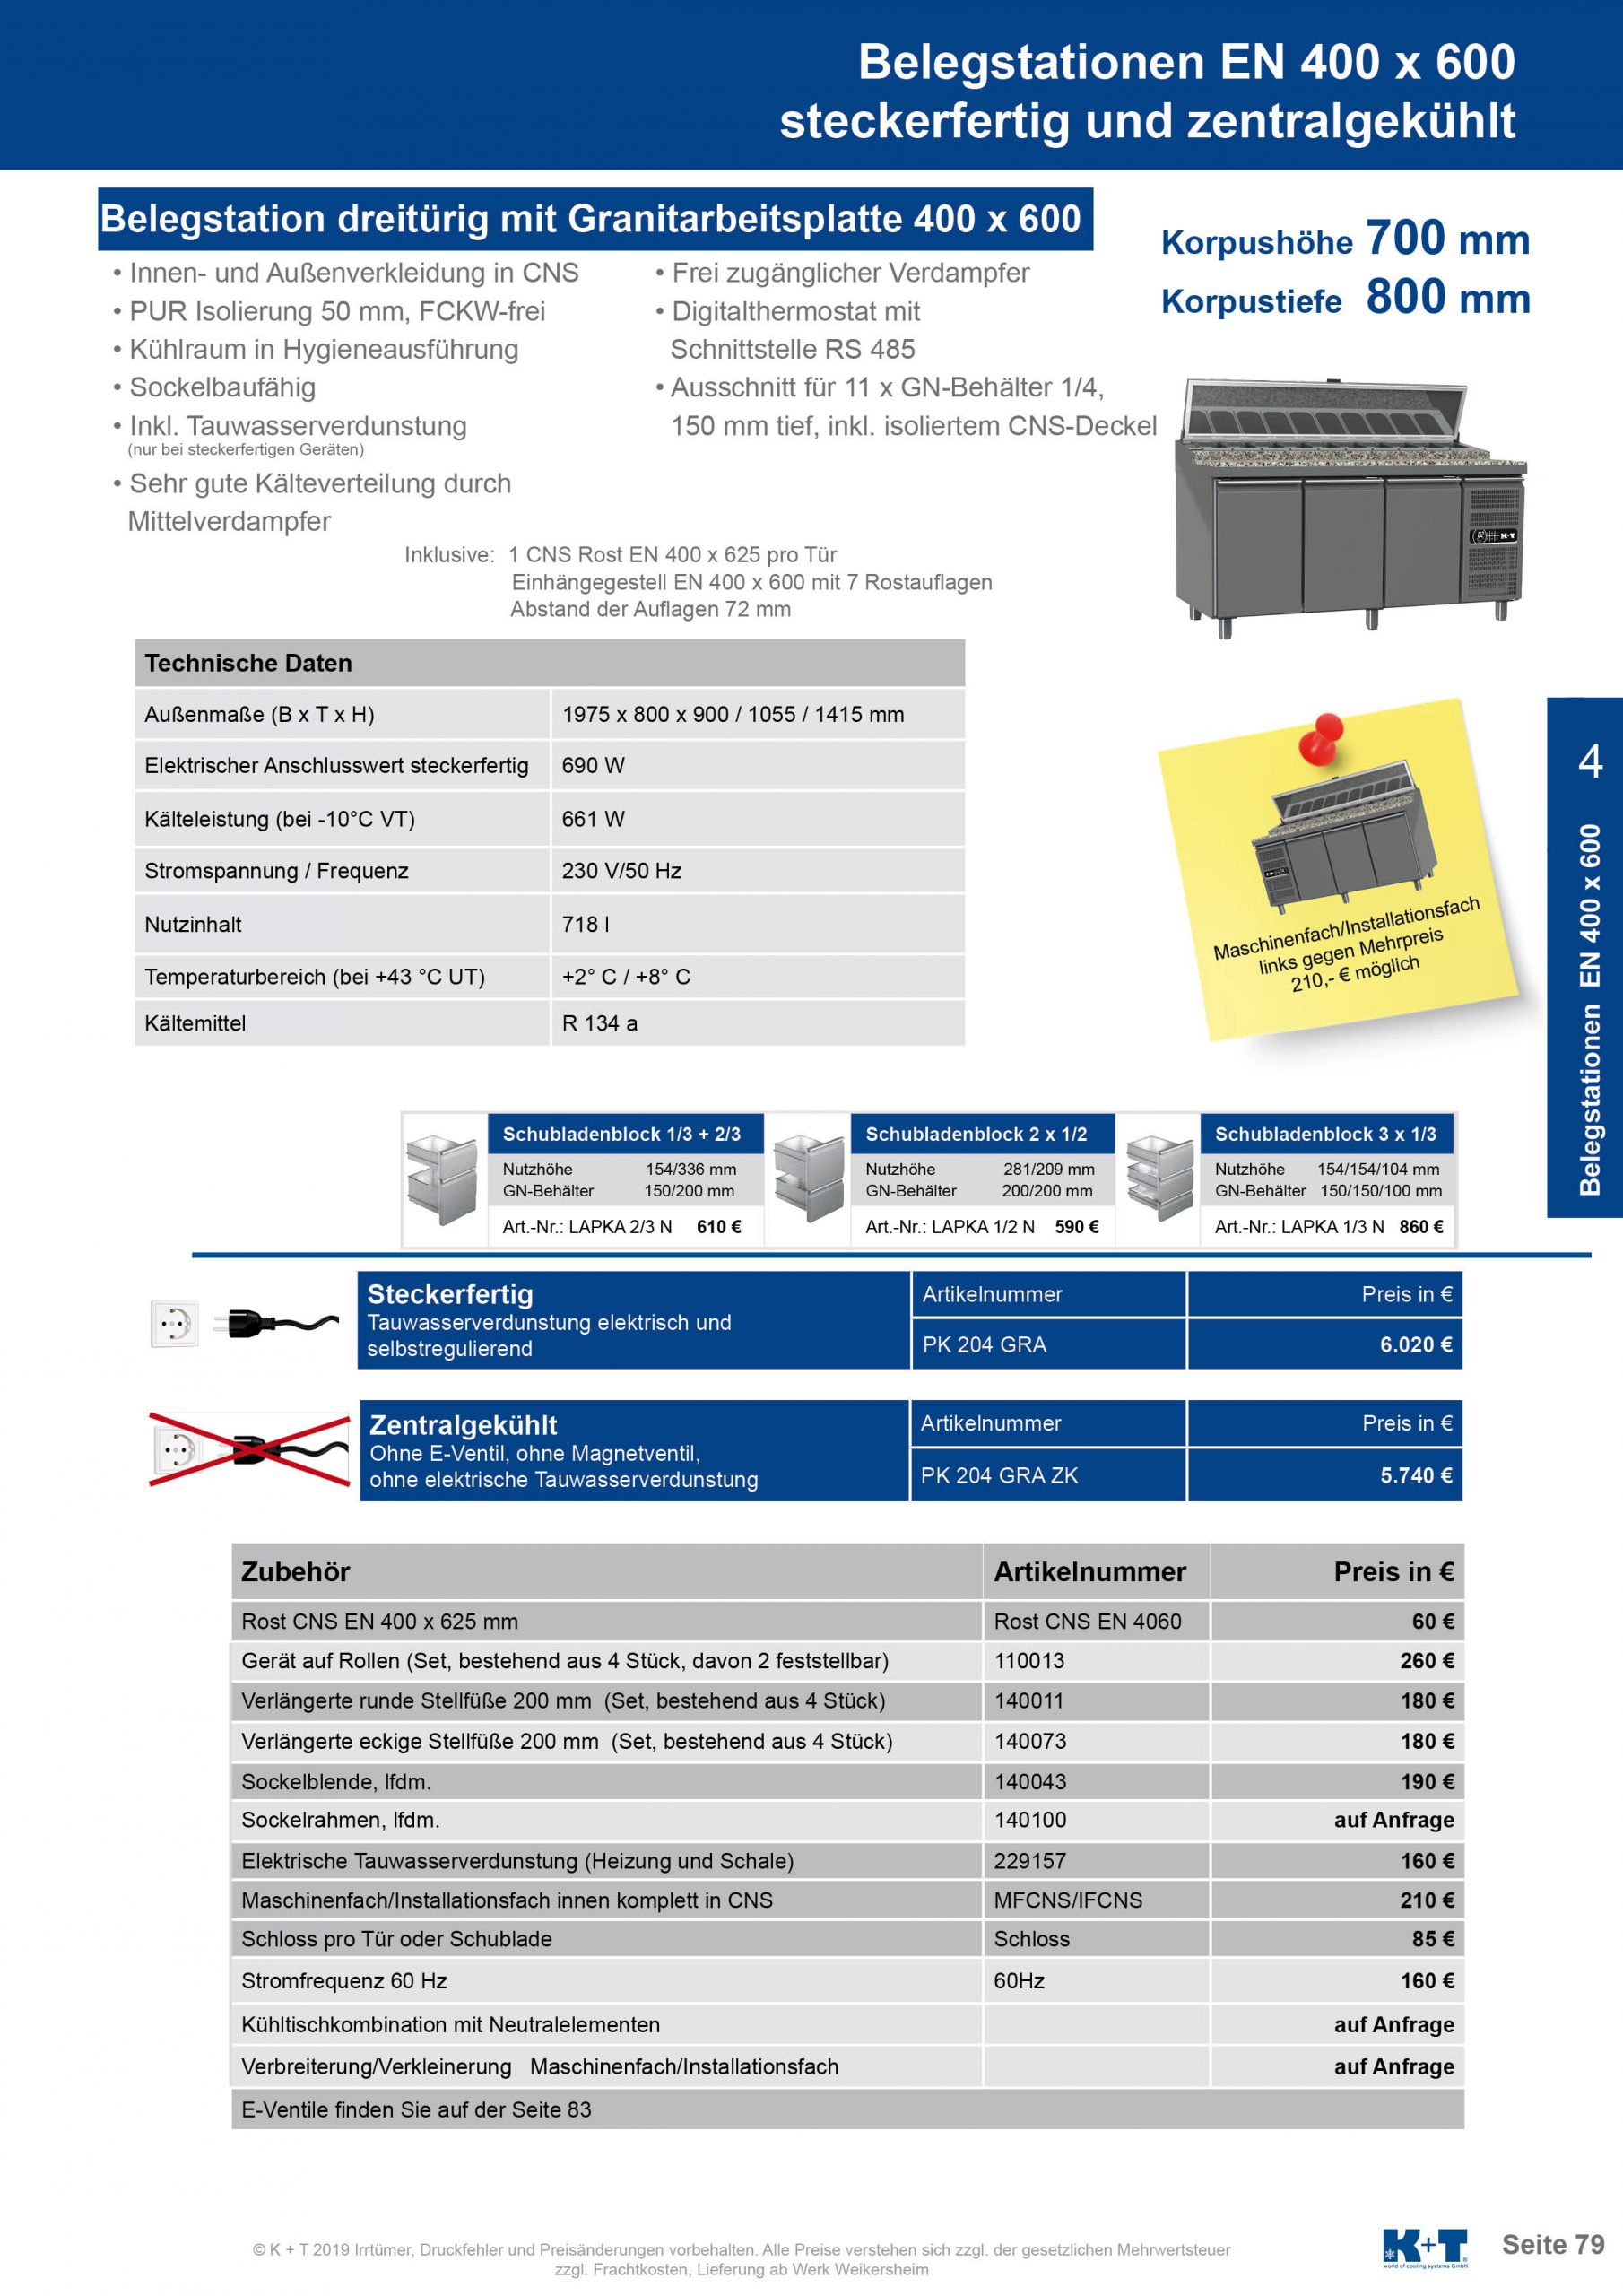 Belegstation Euronorm 400 x 600 Korpushöhe 700, Tiefe 800 zentralgekühlt 4